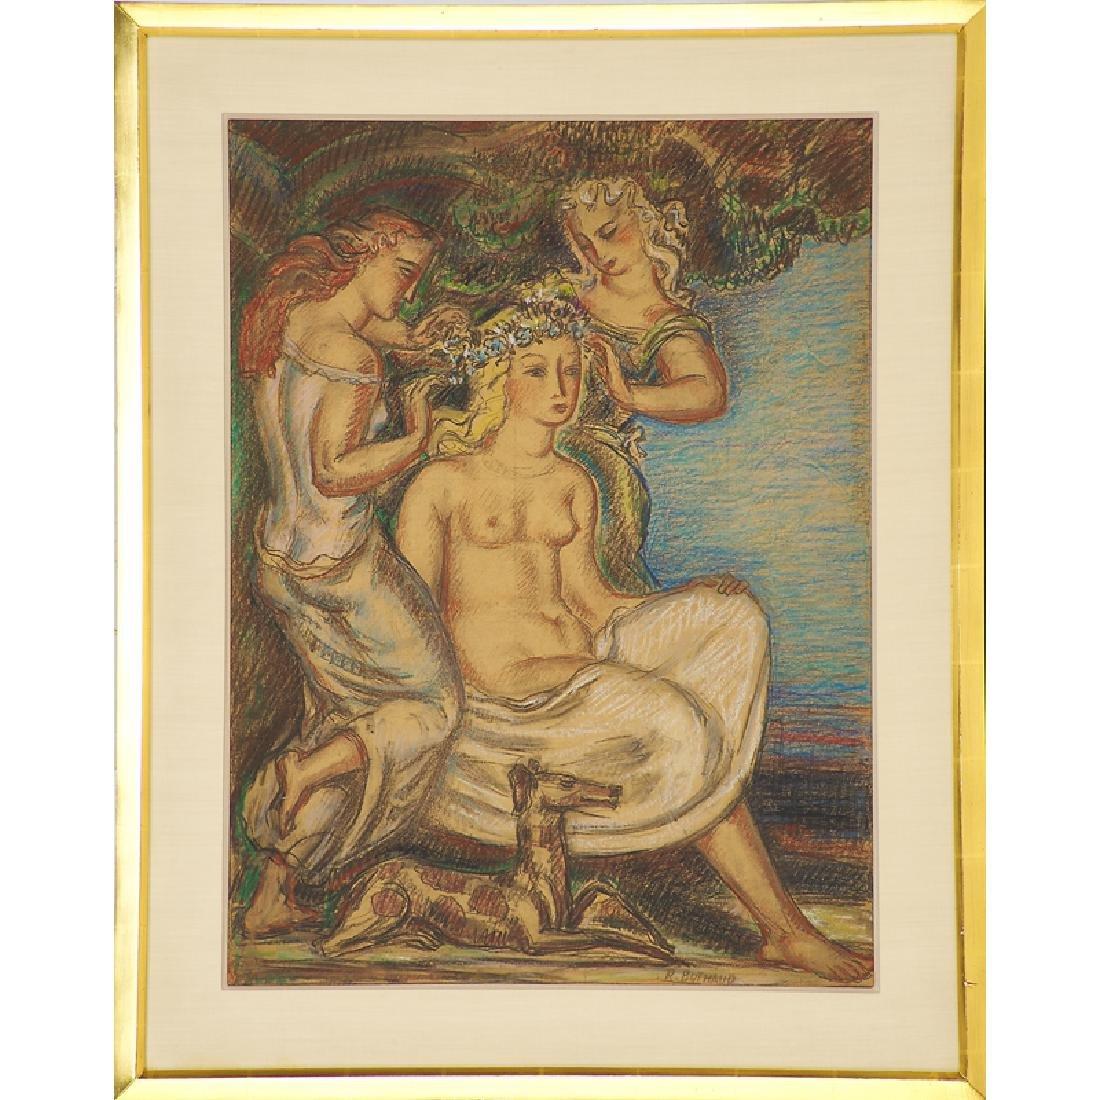 RENE BUTHAUD Untitled cartoon, nude with maidens